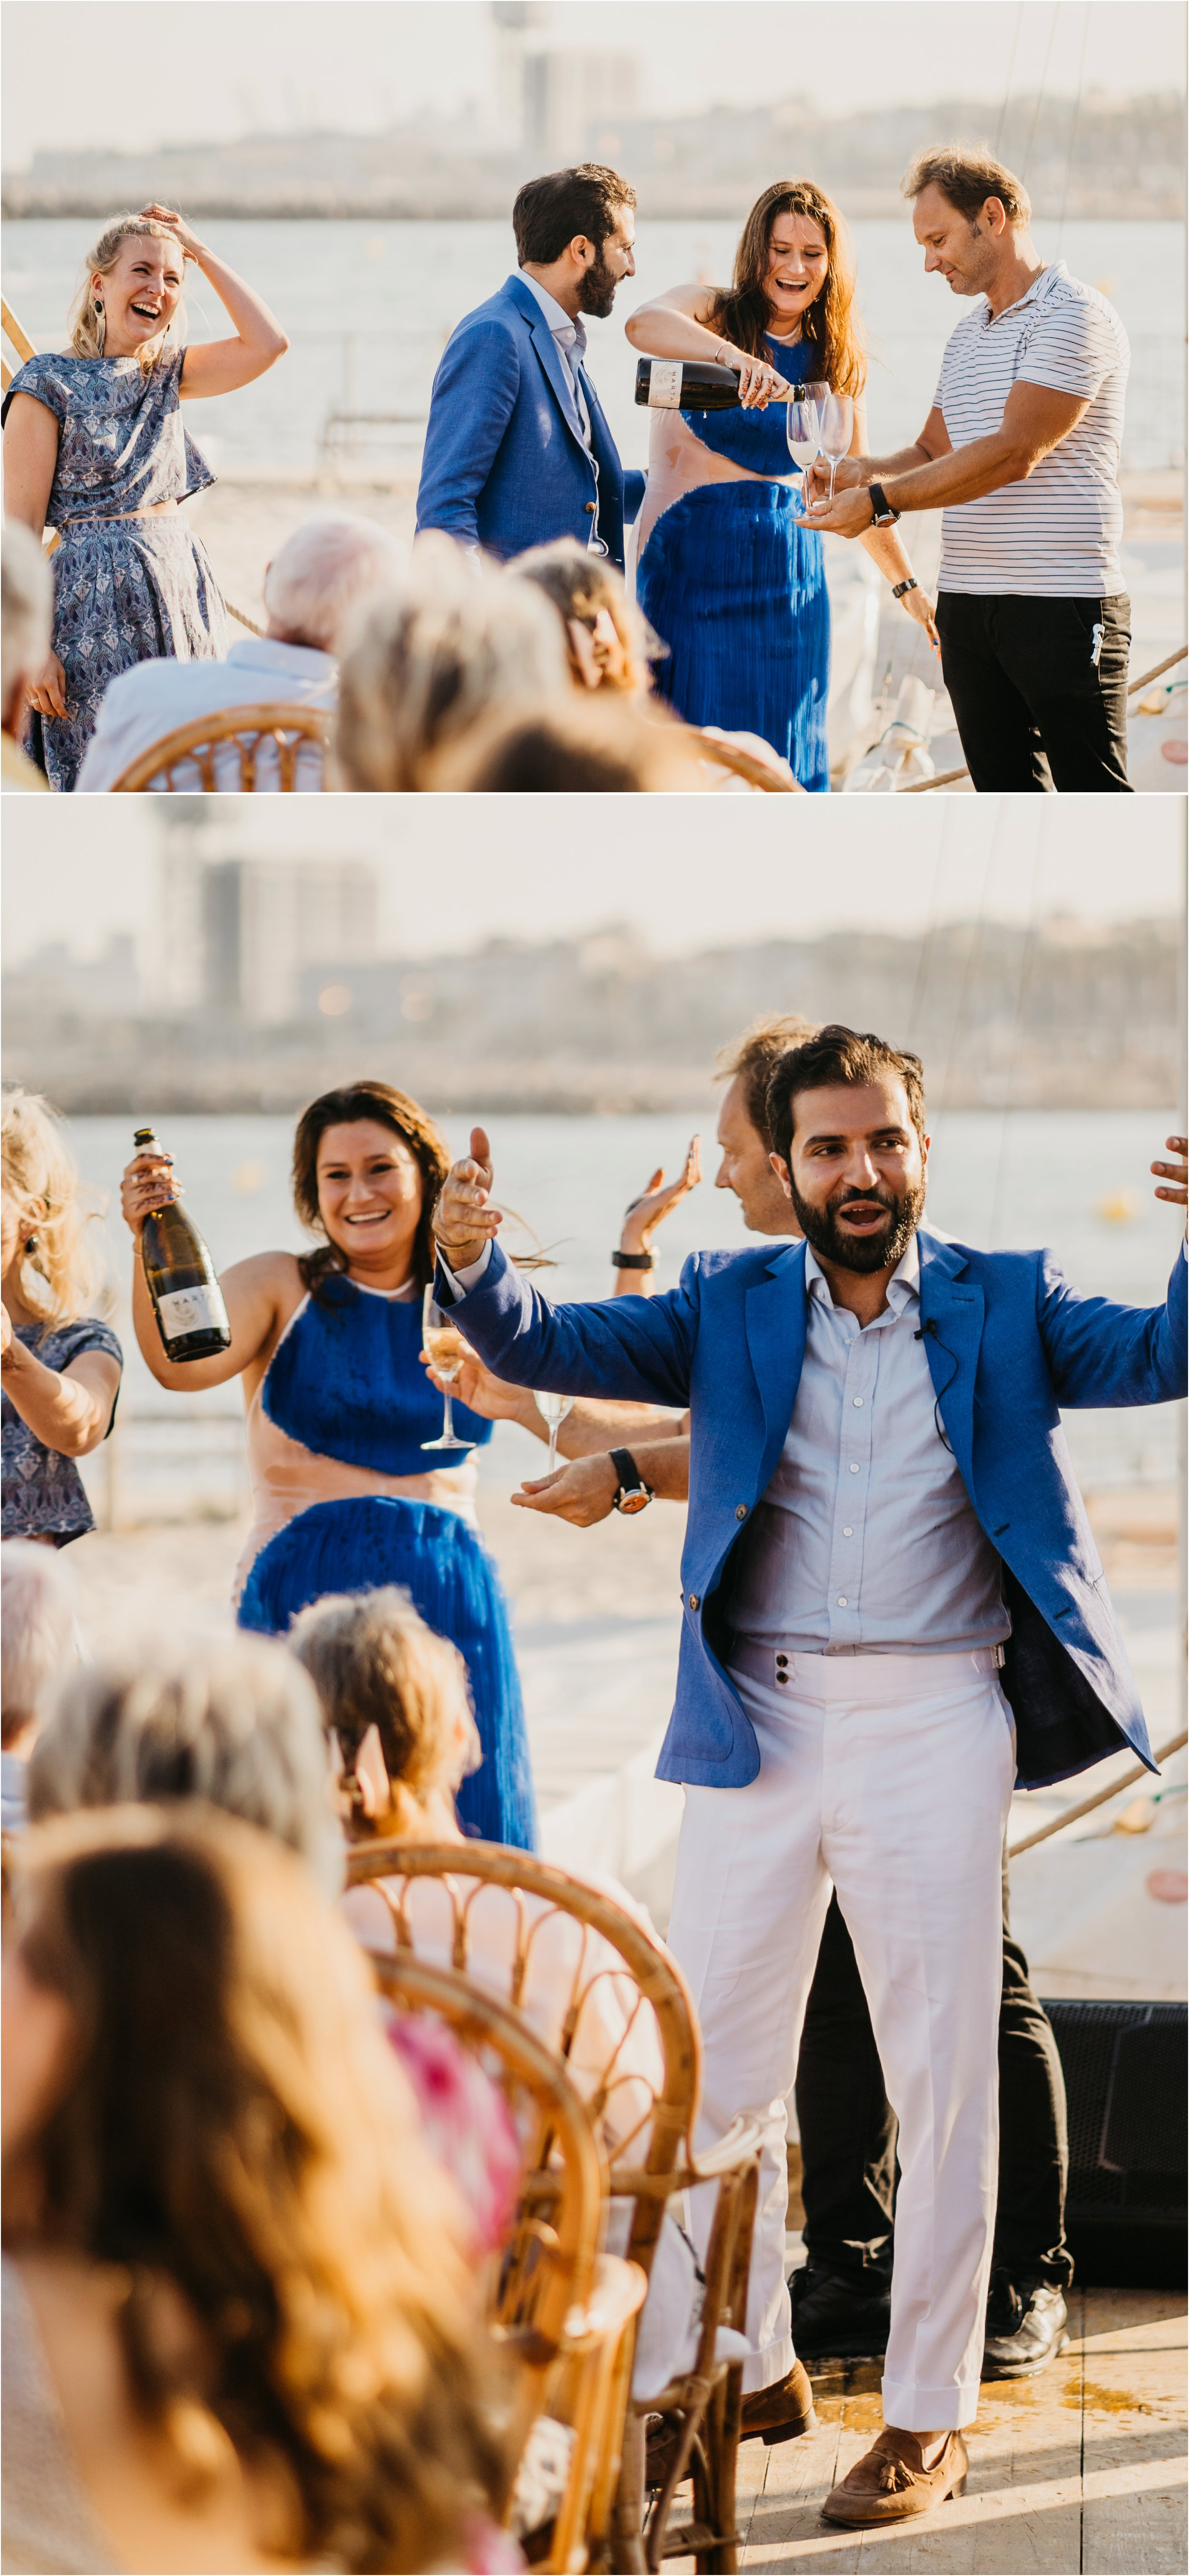 Barcelona Spain destination wedding photographer_0120.jpg